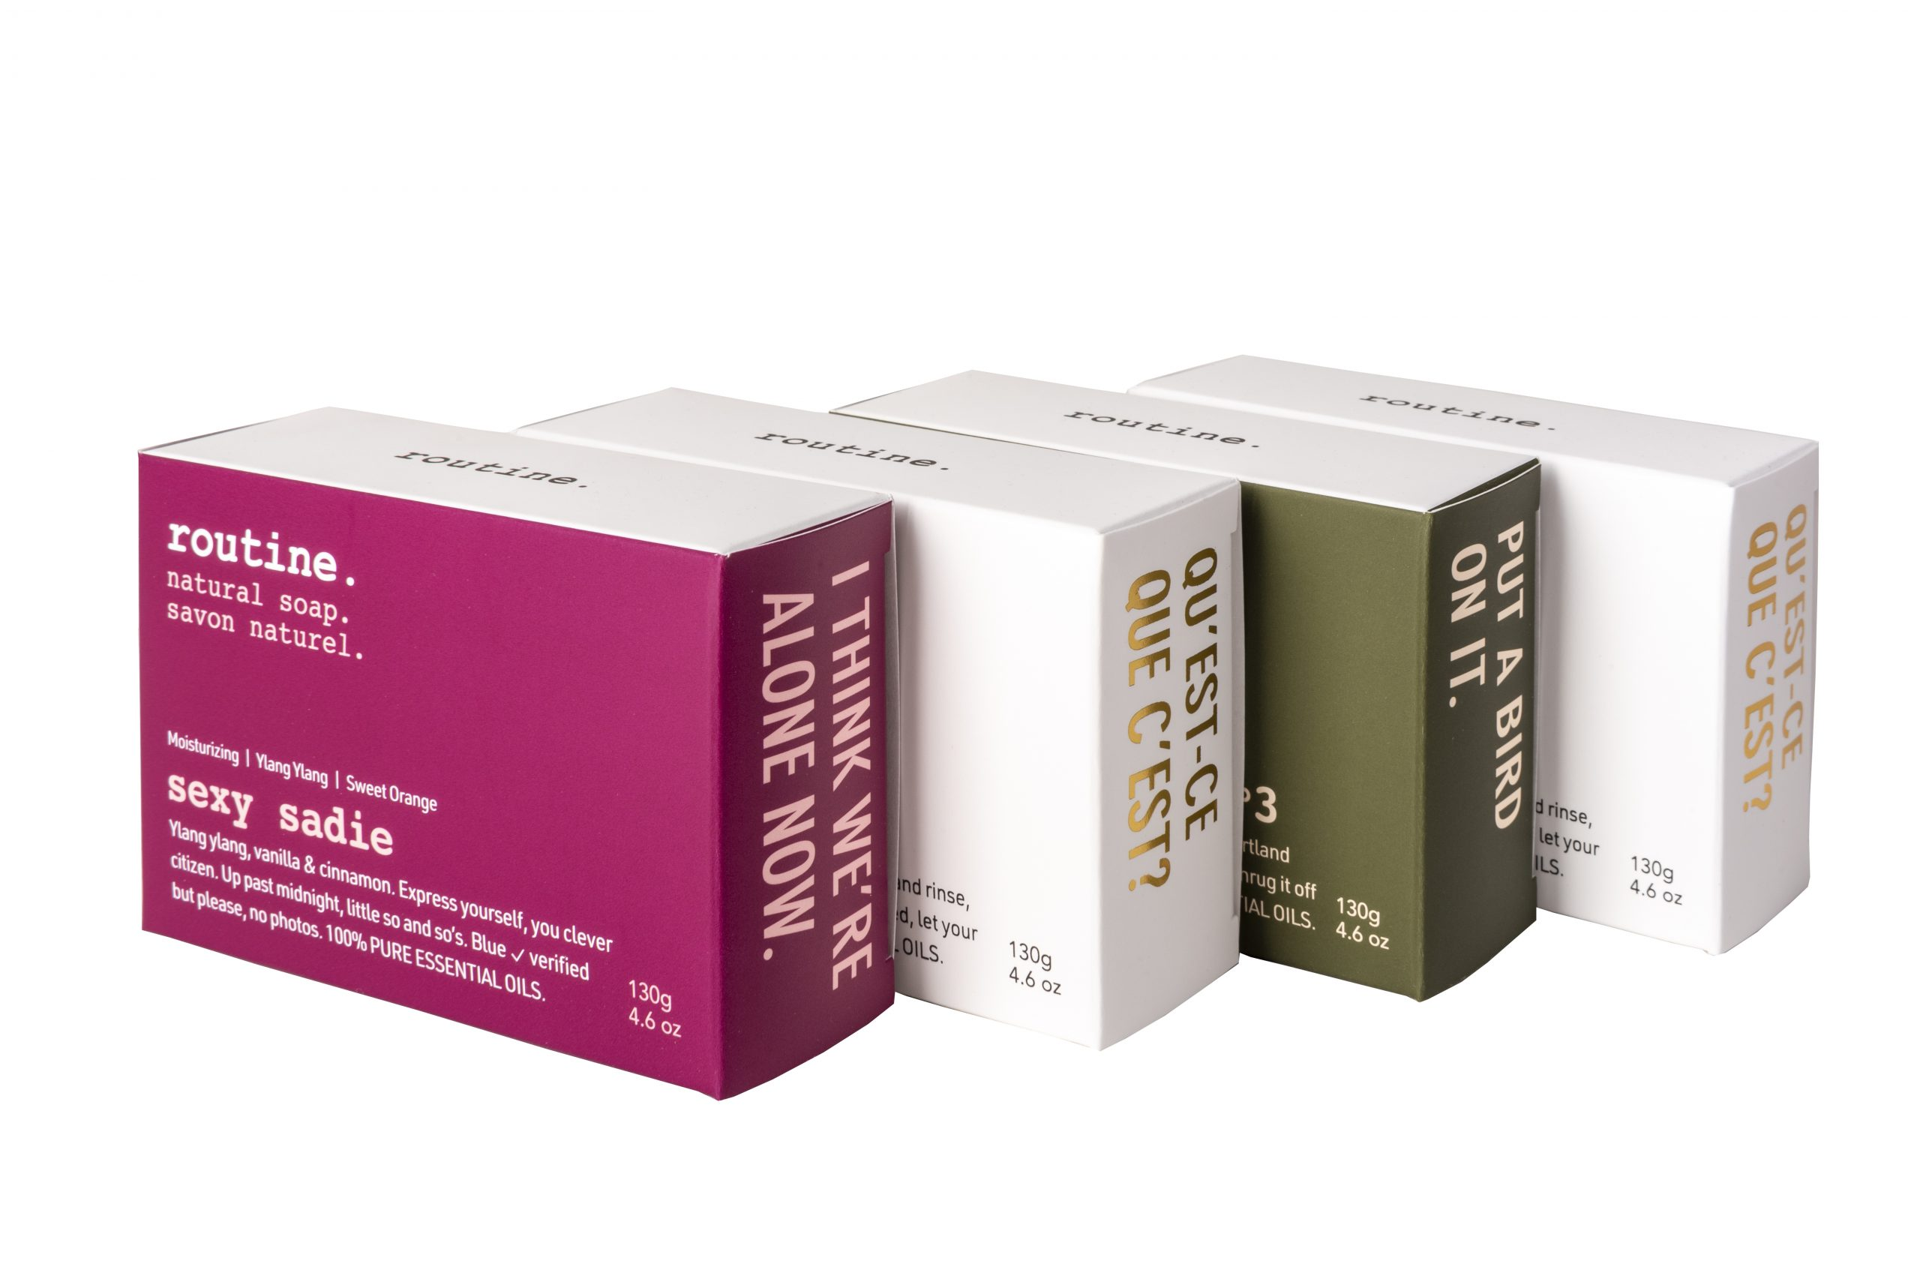 Routine Natural Soap Box